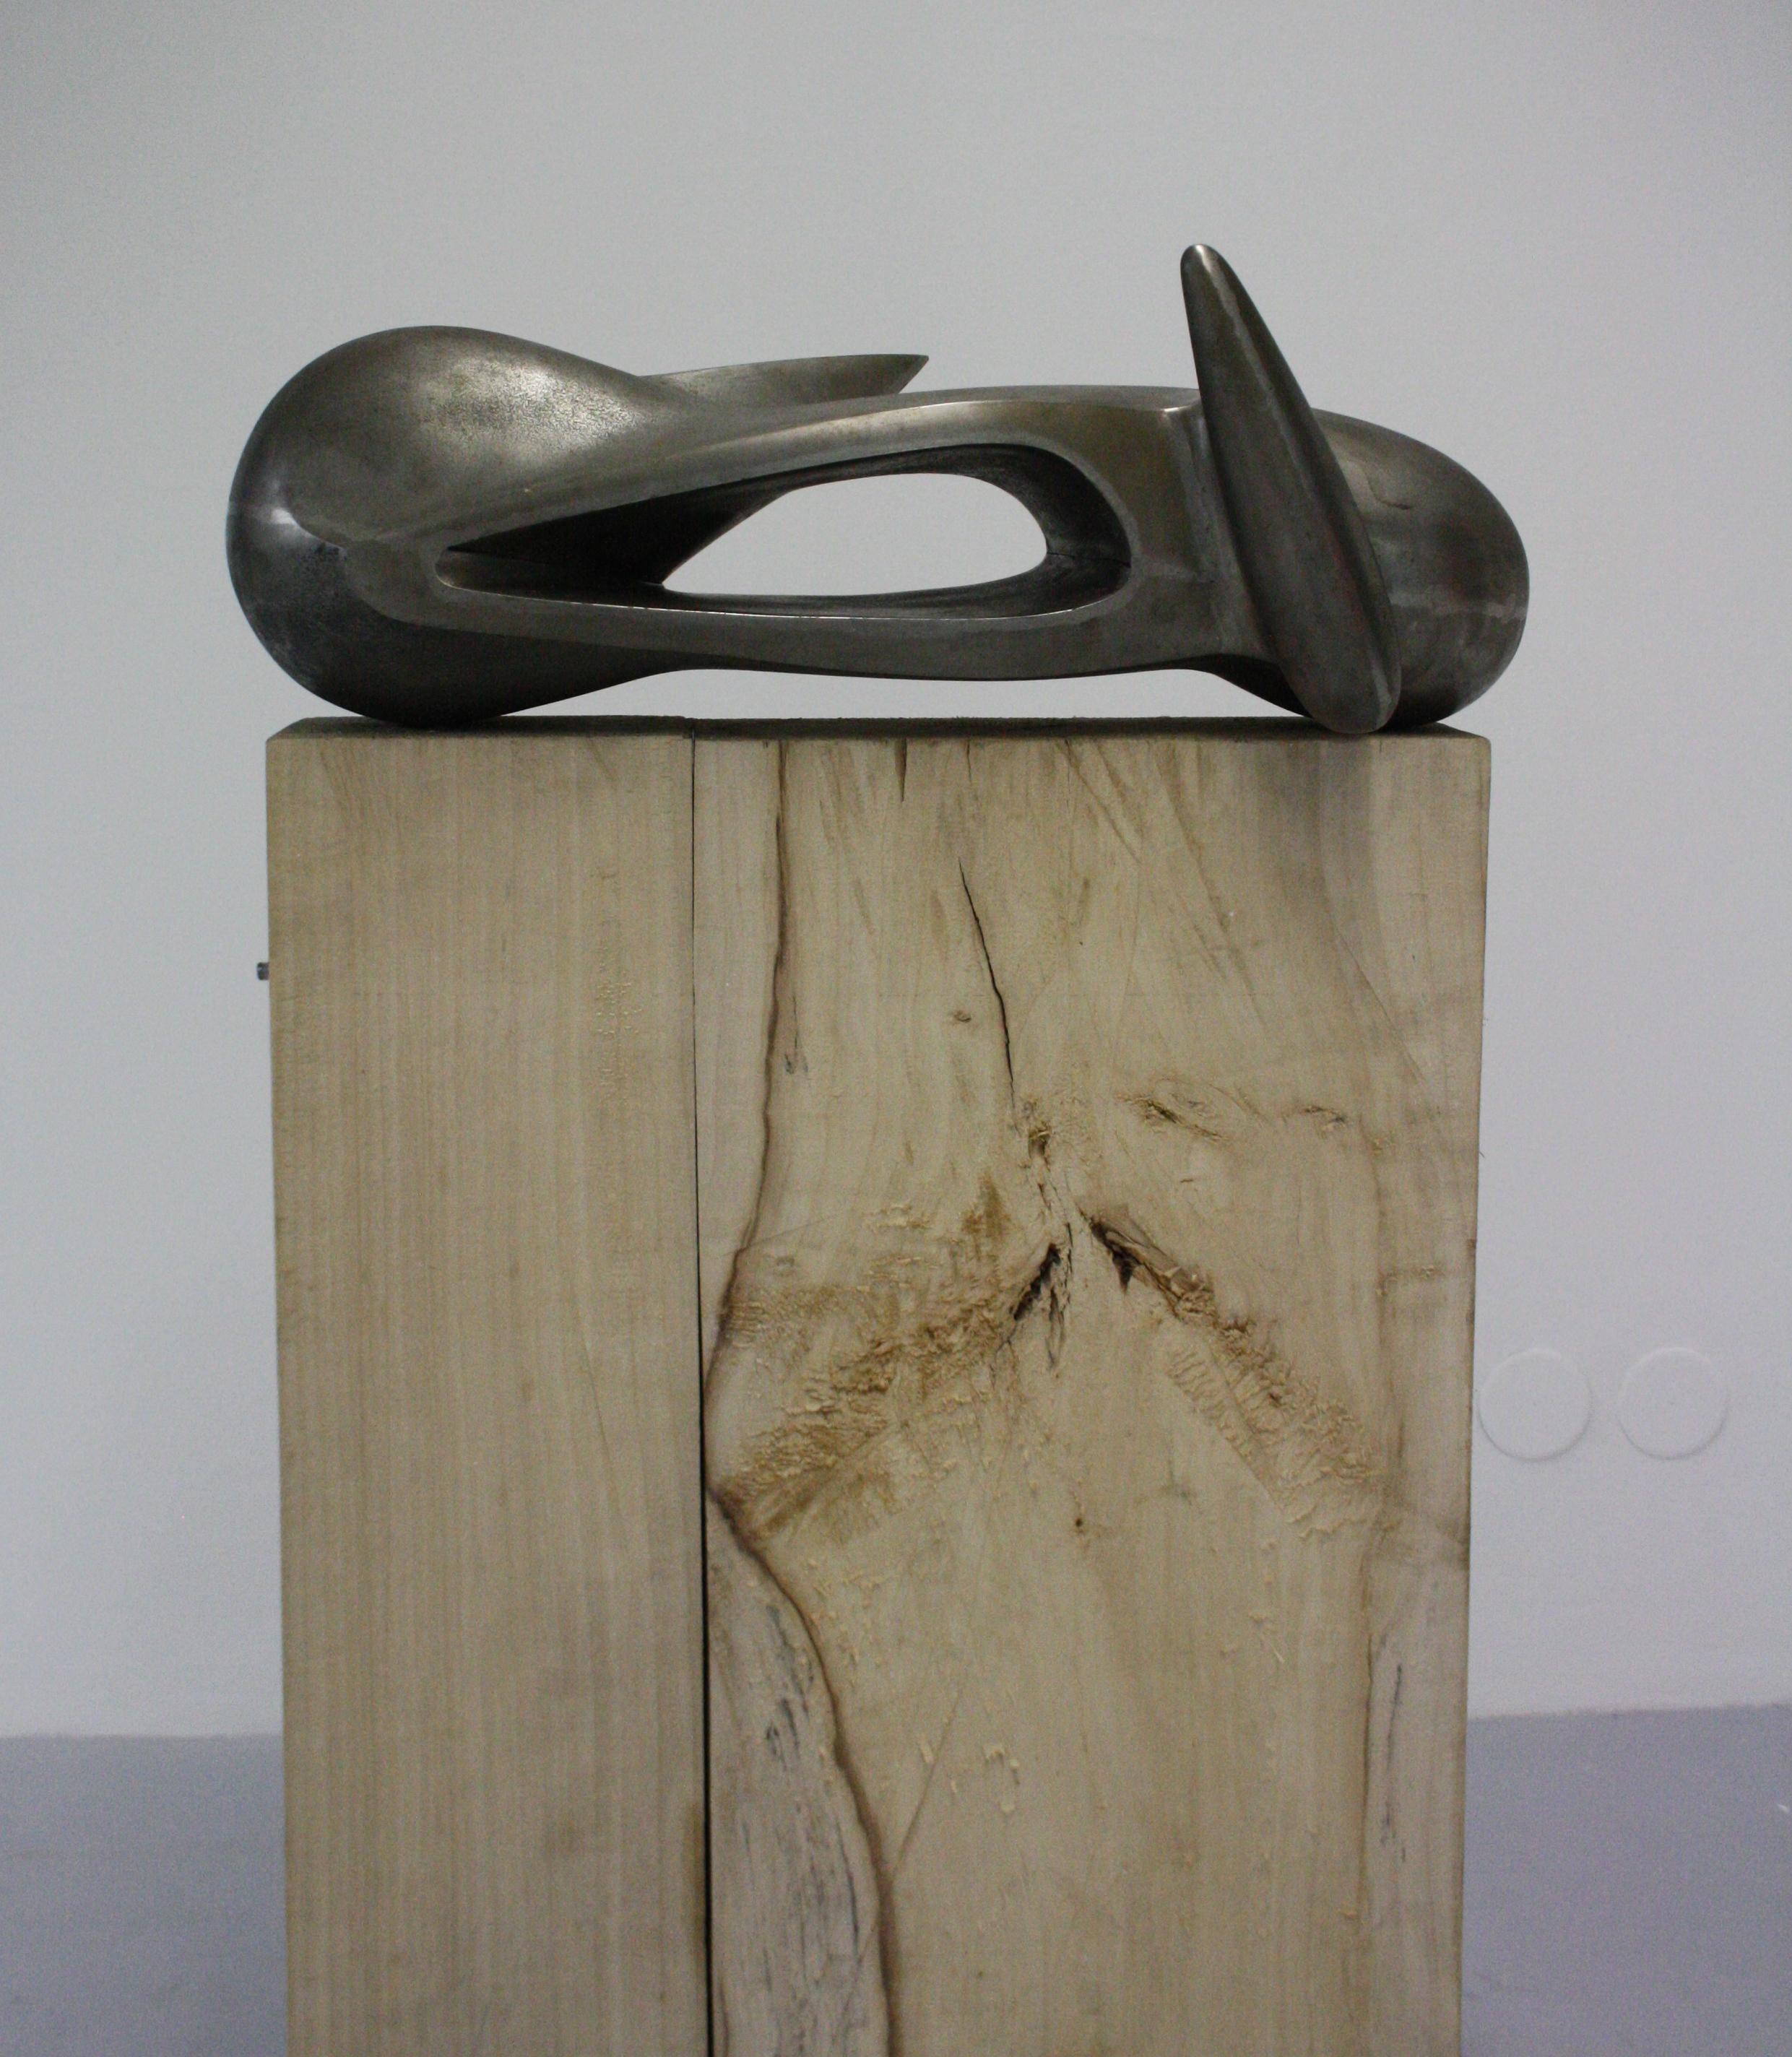 Stefan Milkov, Amorfoid II, 2013, 75 x 22 x 28 cm, kov